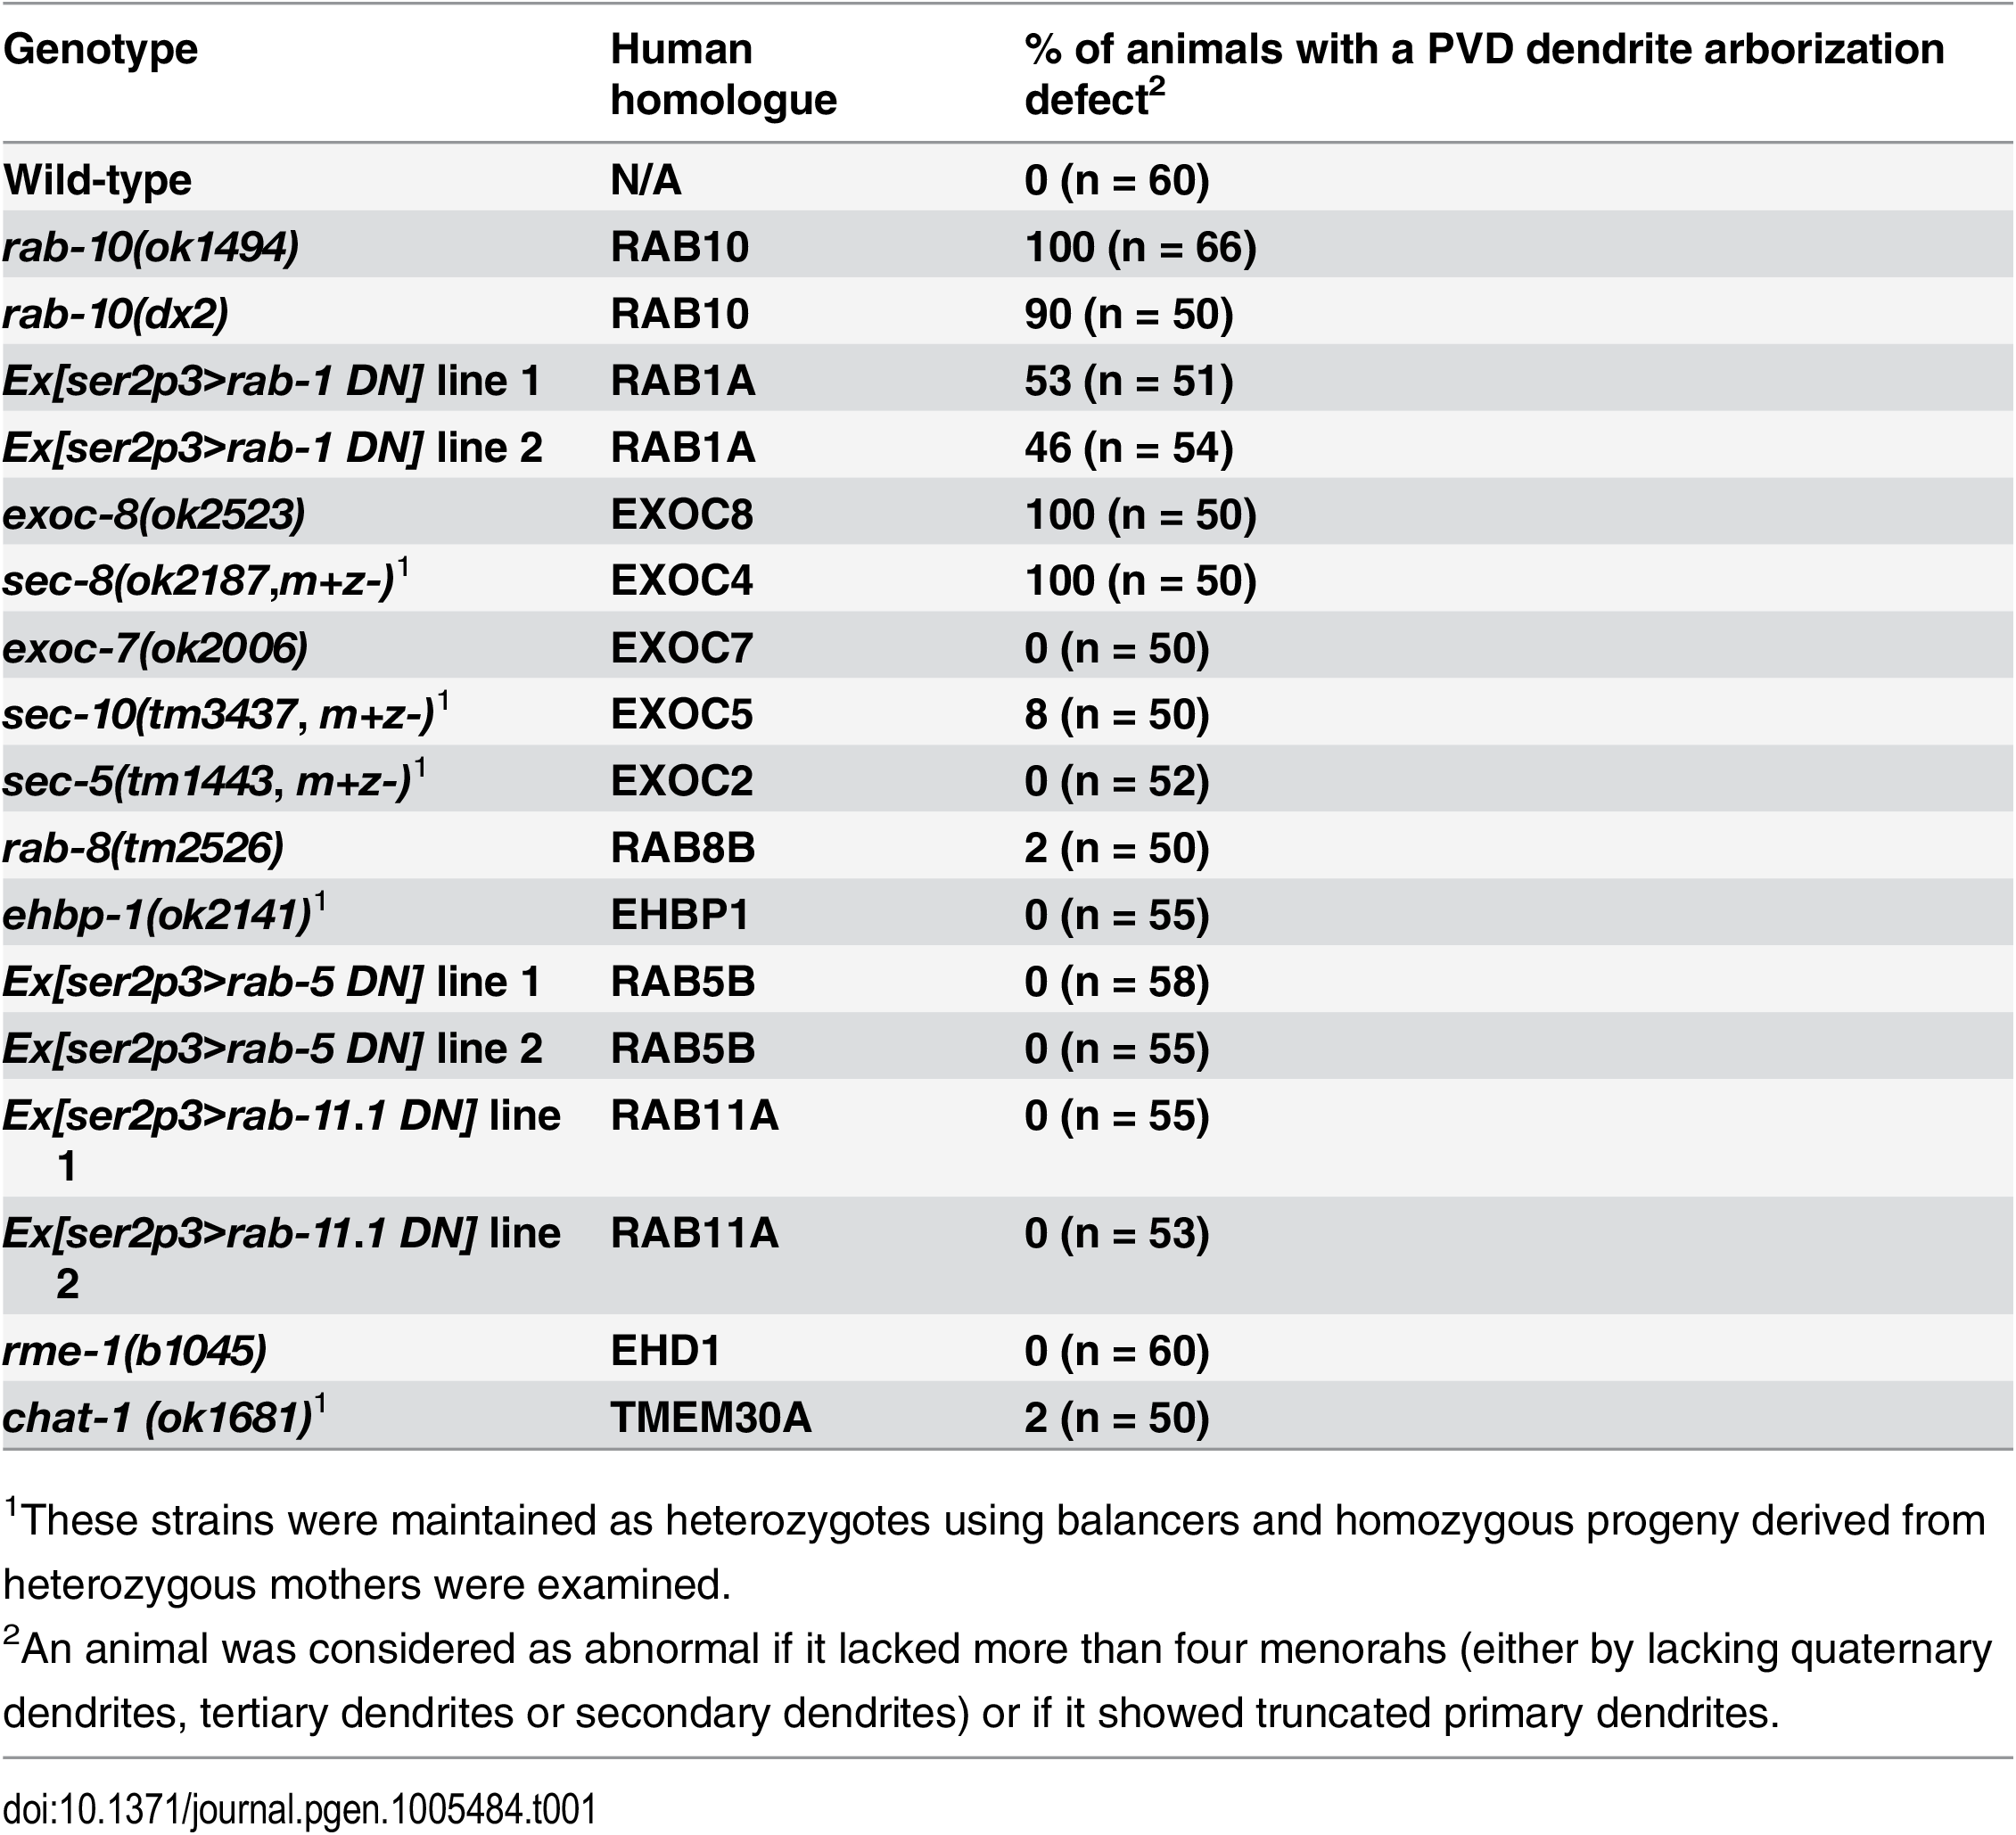 PVD dendrite morphogenesis is defective in <i>rab-10</i>, <i>rab-1</i> and exocyst mutants.